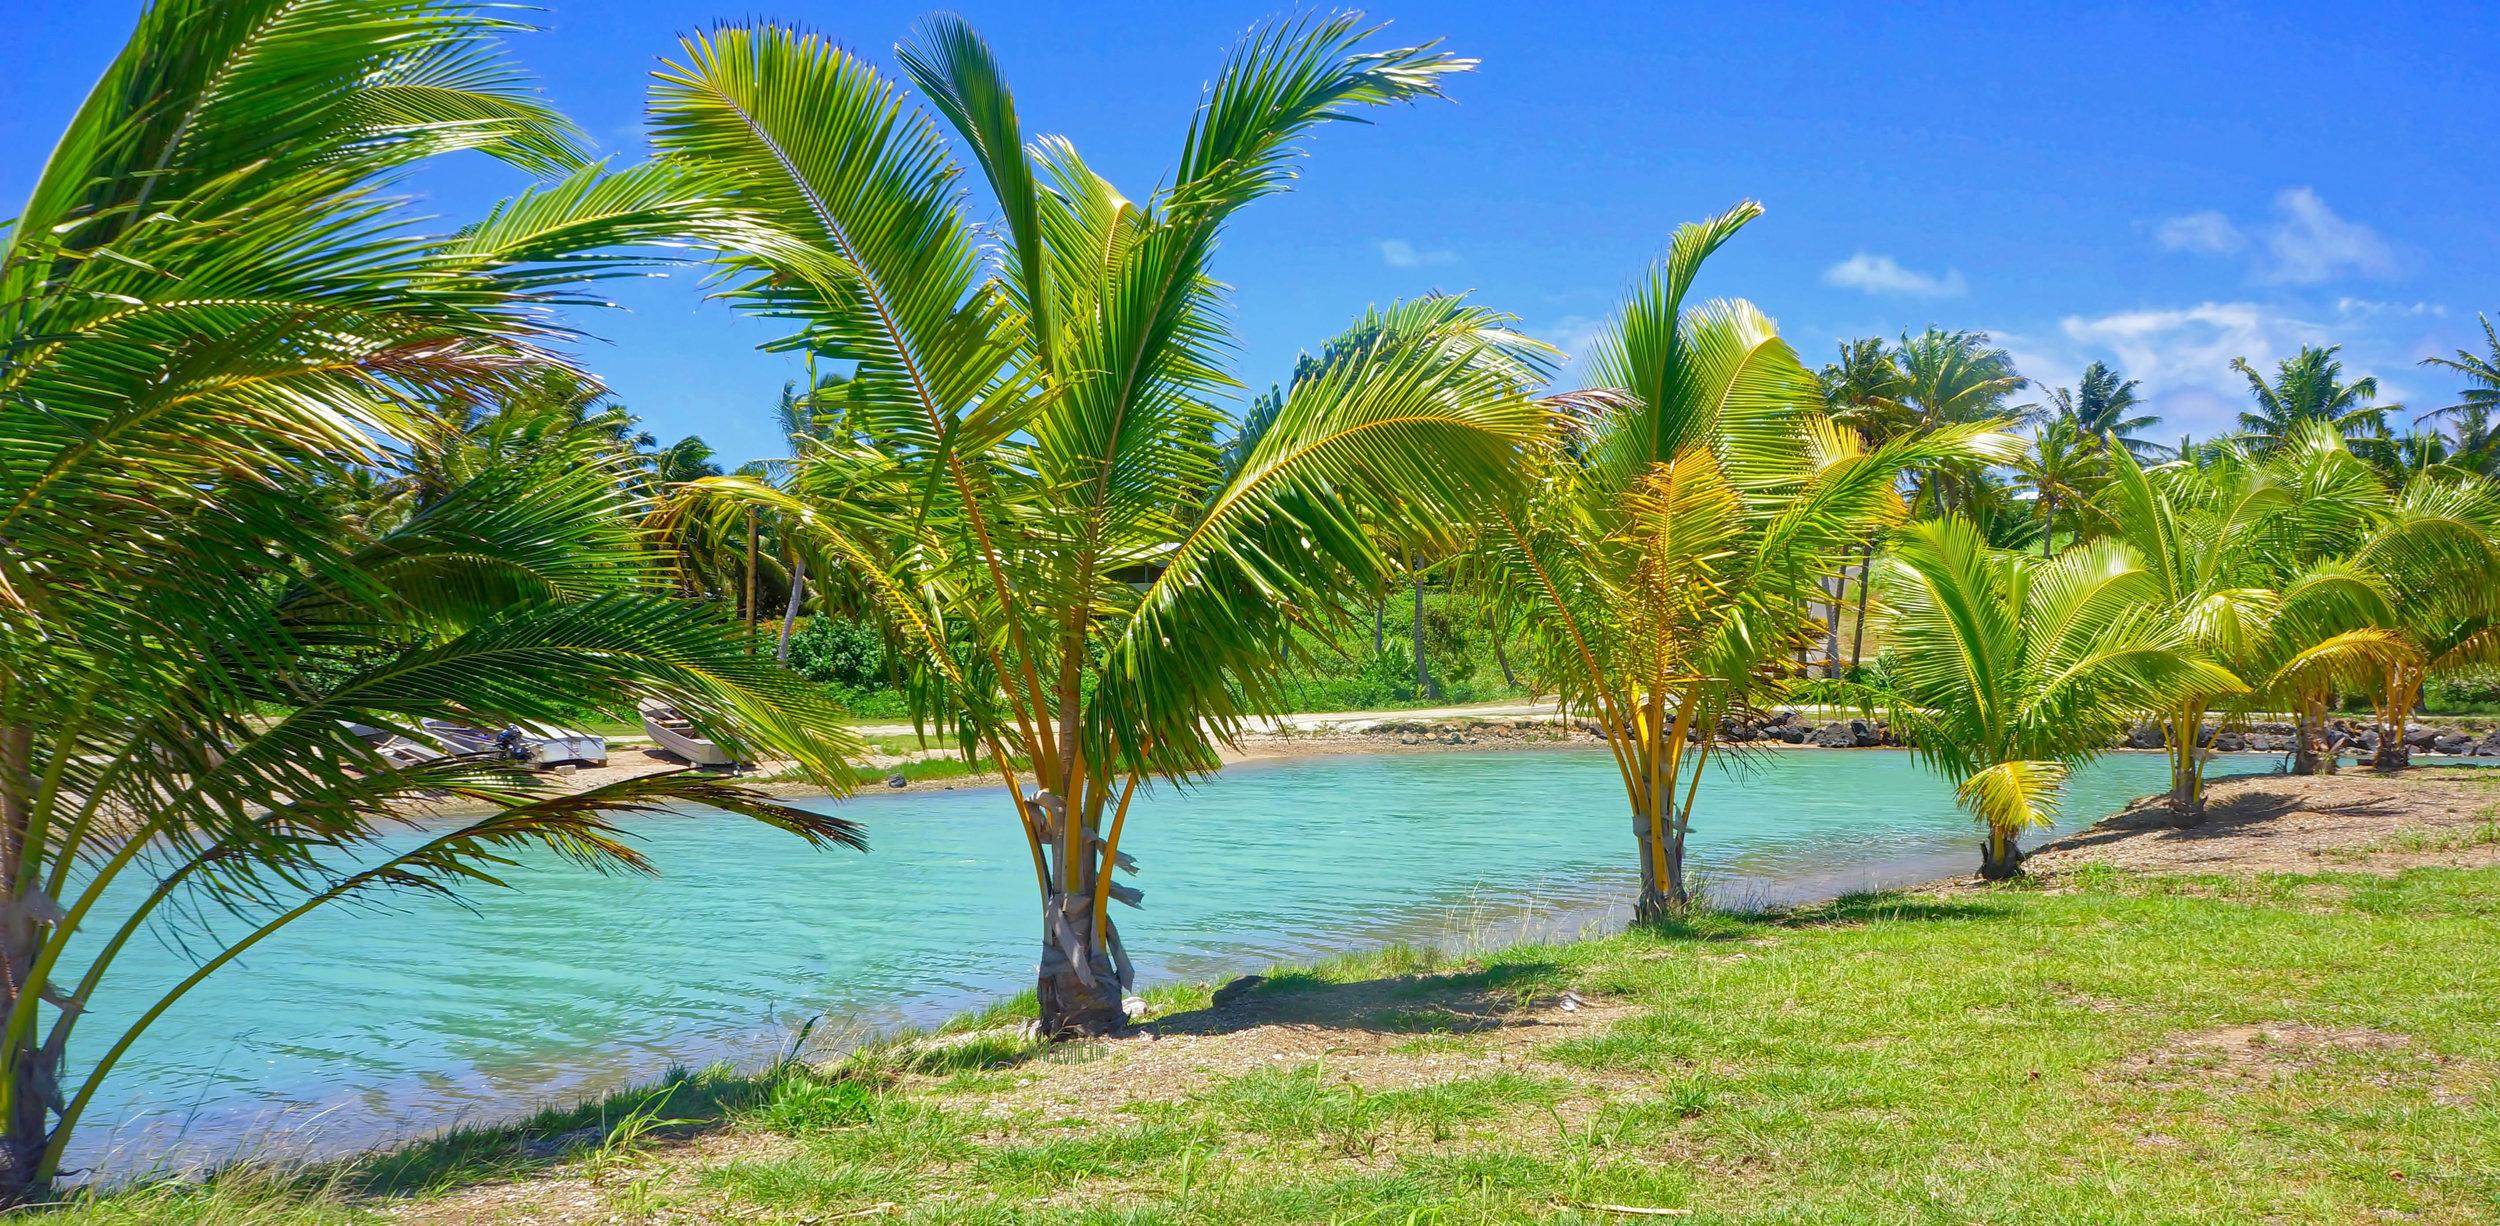 Natural pool, Aitutaki, Cook Islands